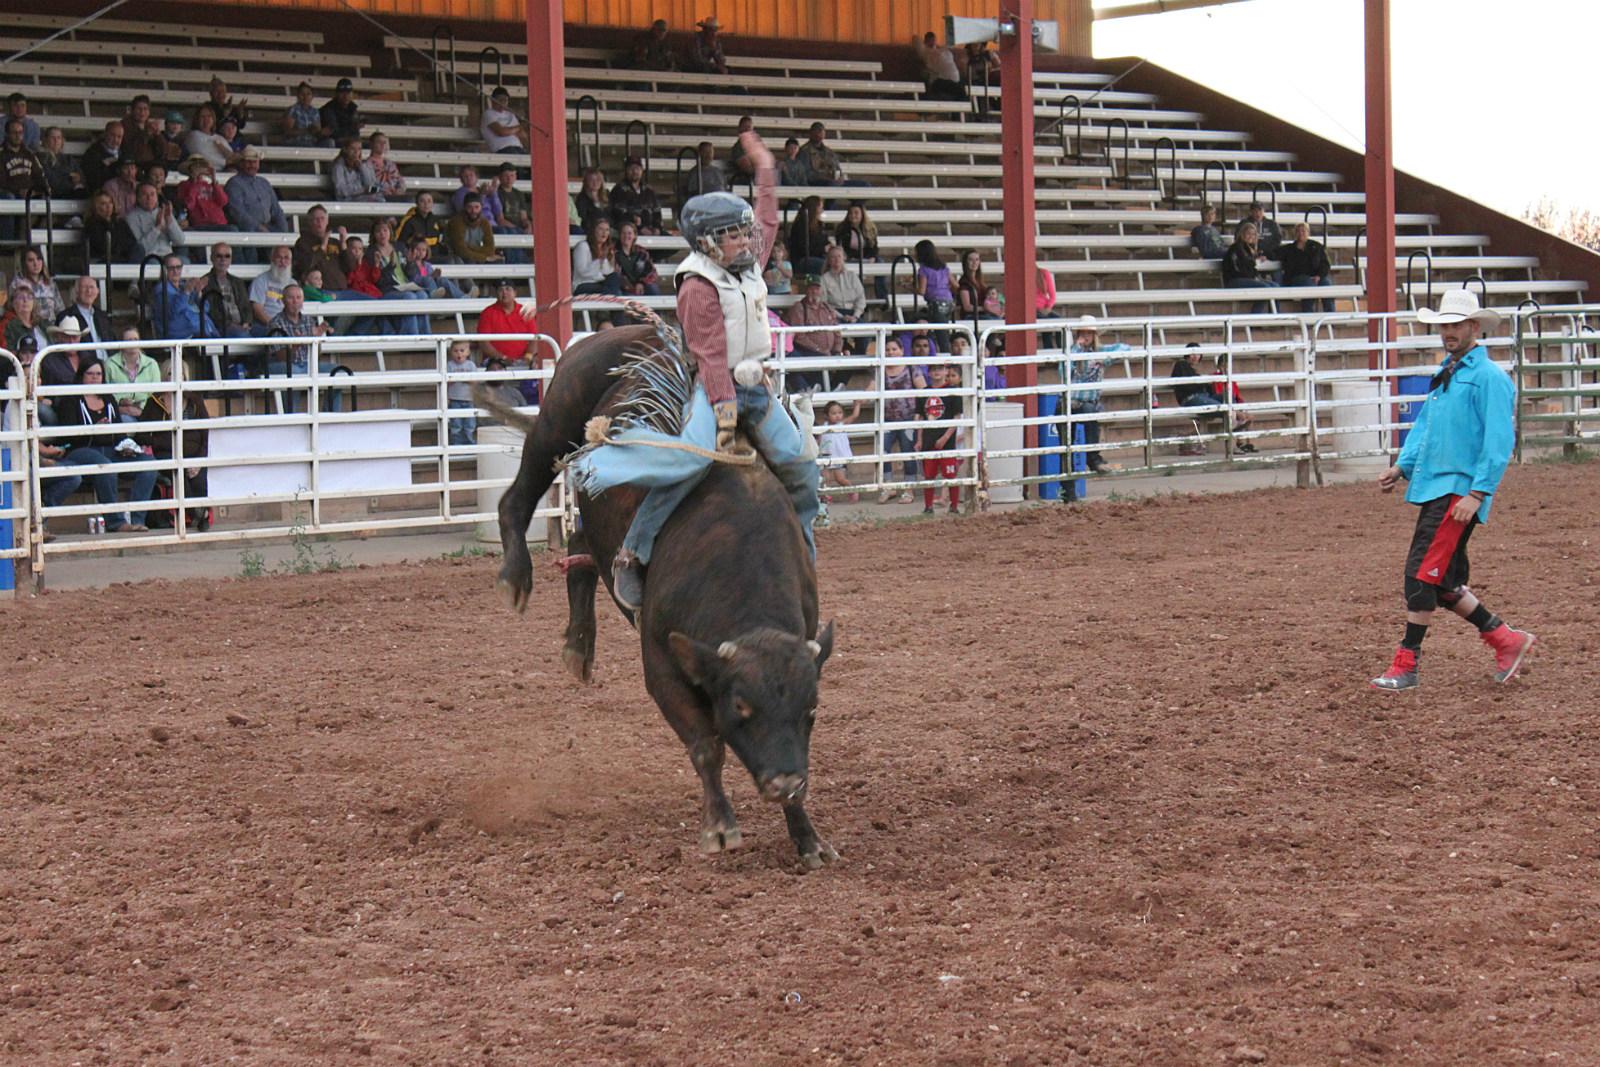 Six Cowboys Win Buckles At Jubilee Days Junior Bull Riding